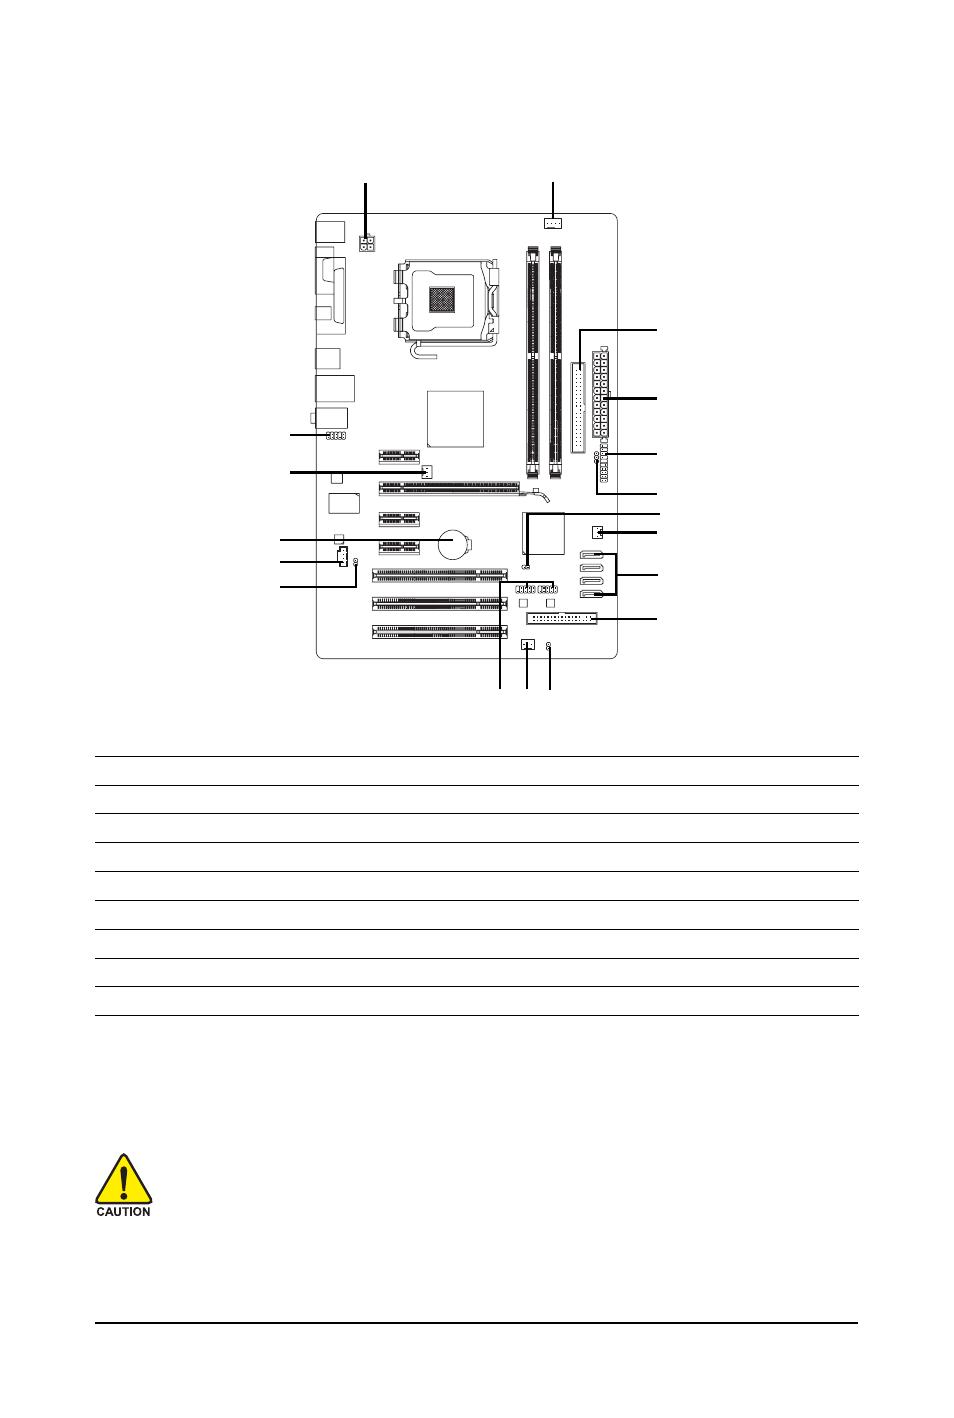 7 internal connectors | GIGABYTE GA-P31-ES3G User Manual | Page 21 /